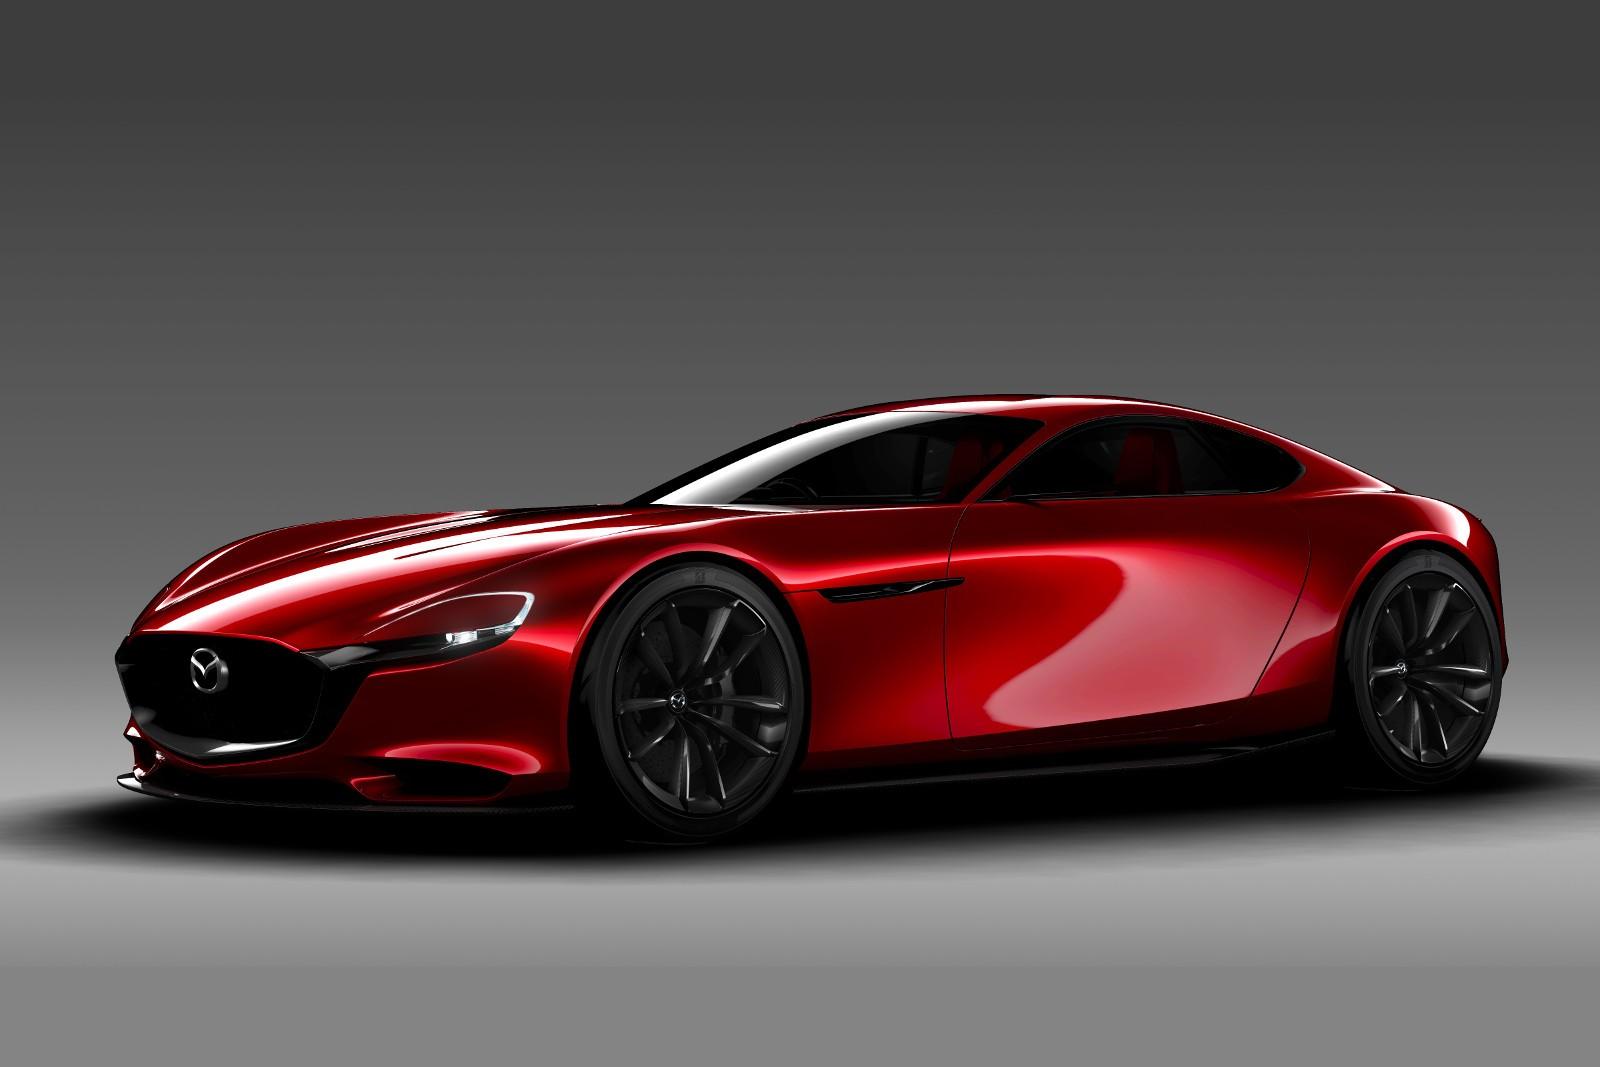 Kekurangan Mazda Sport Harga